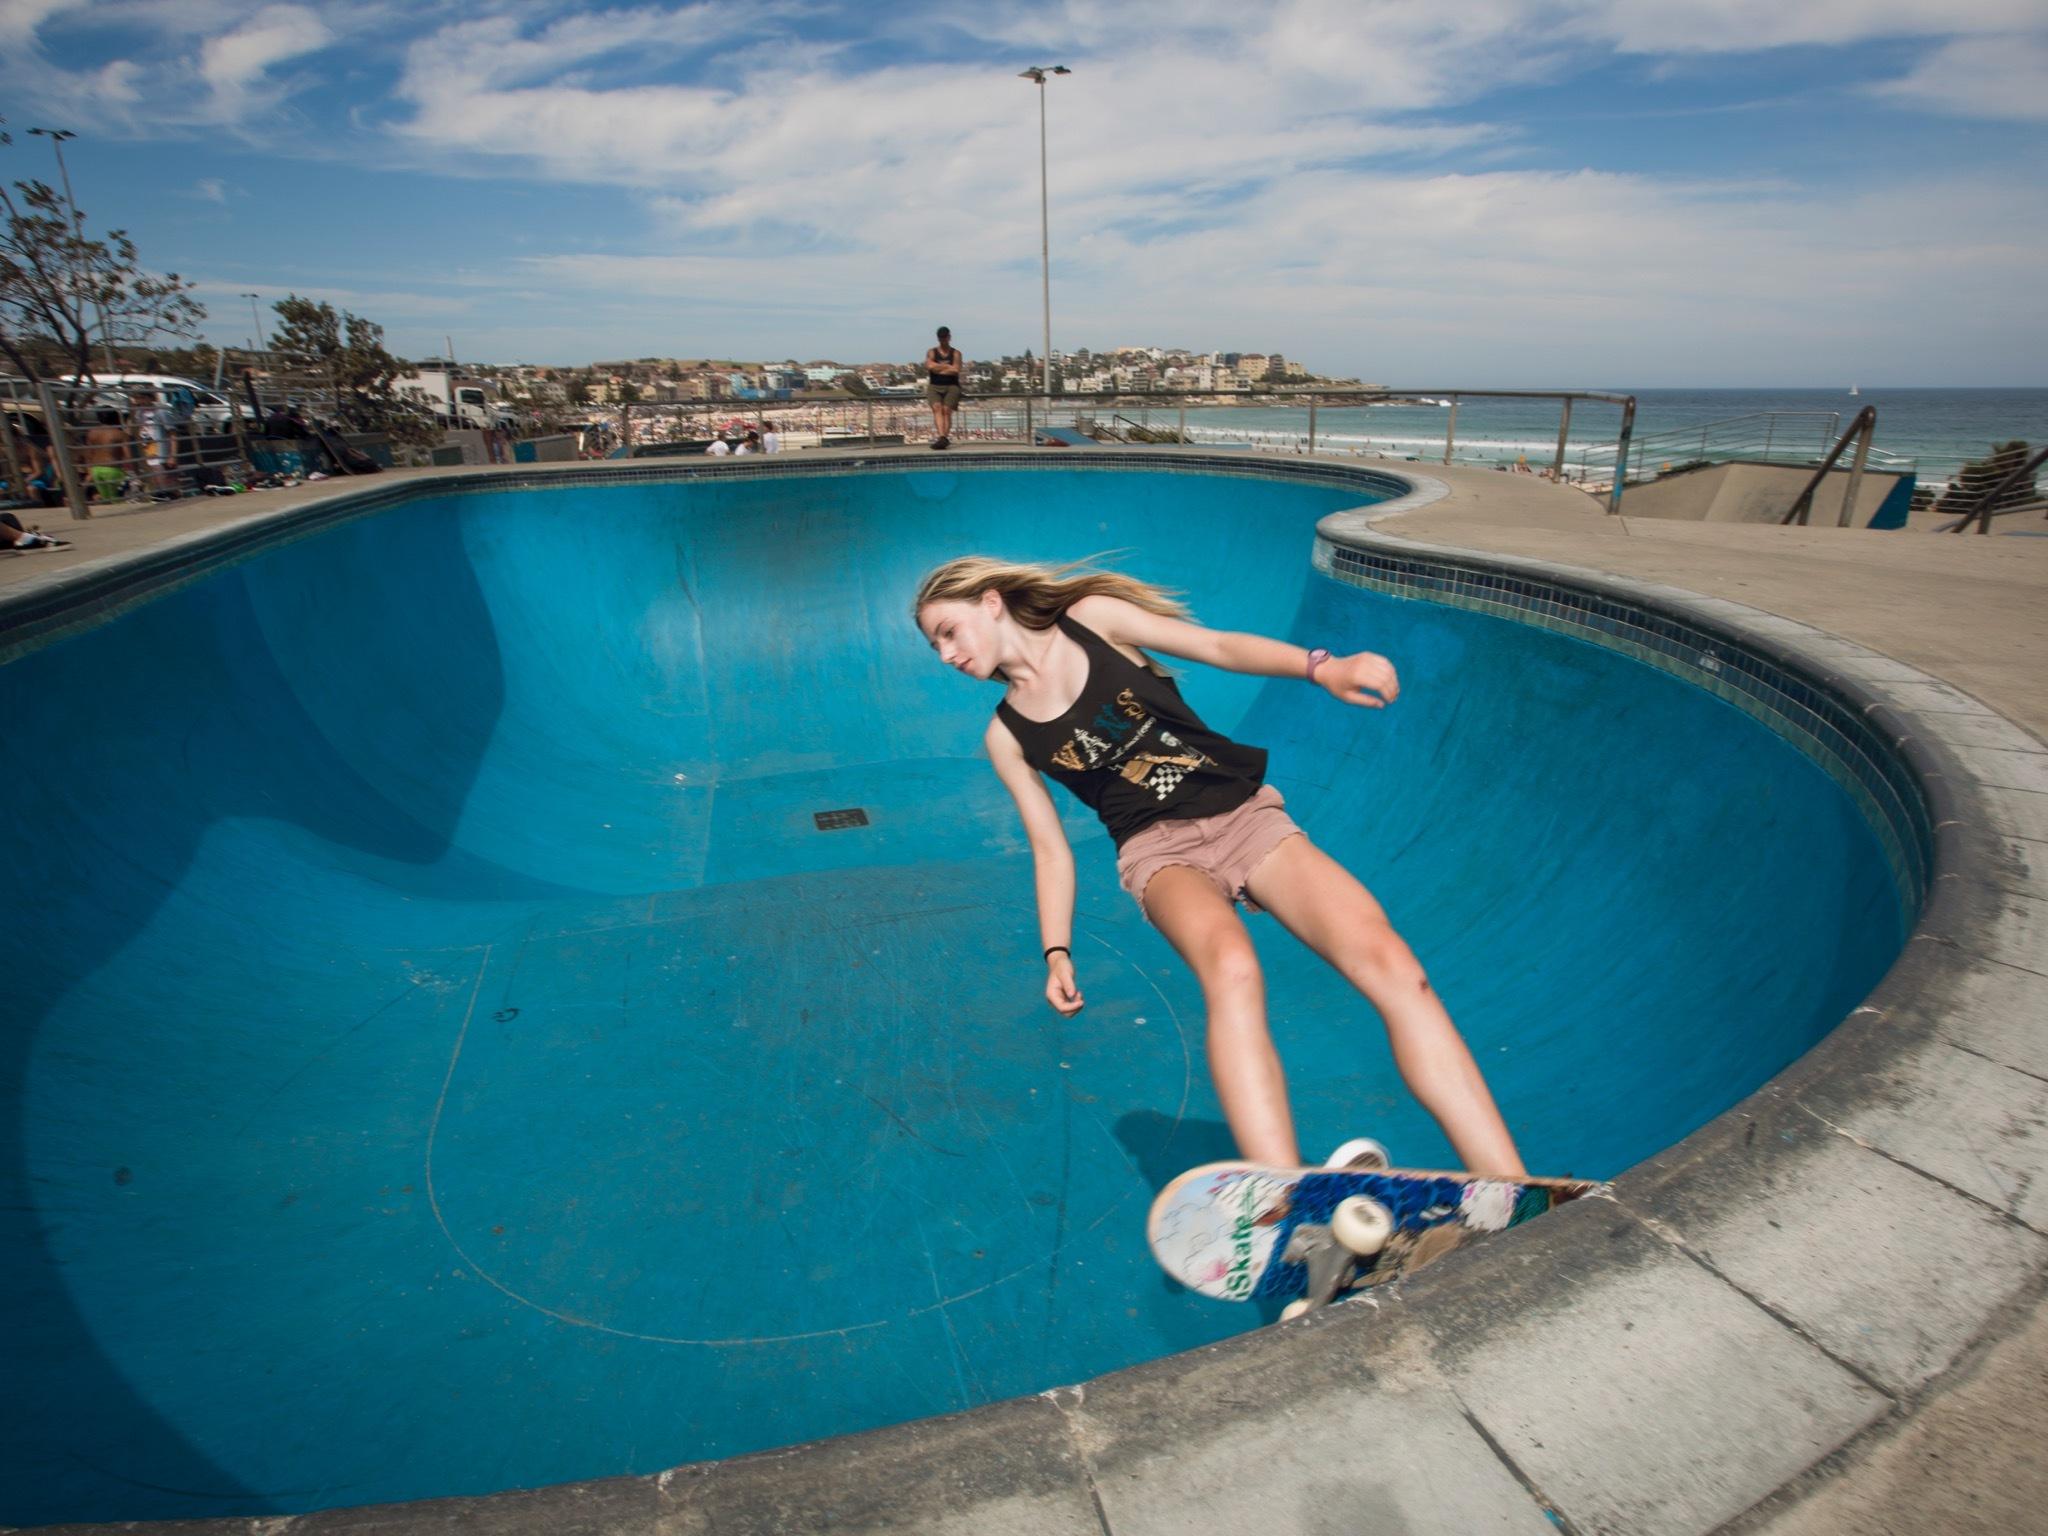 The best skate parks in Sydney